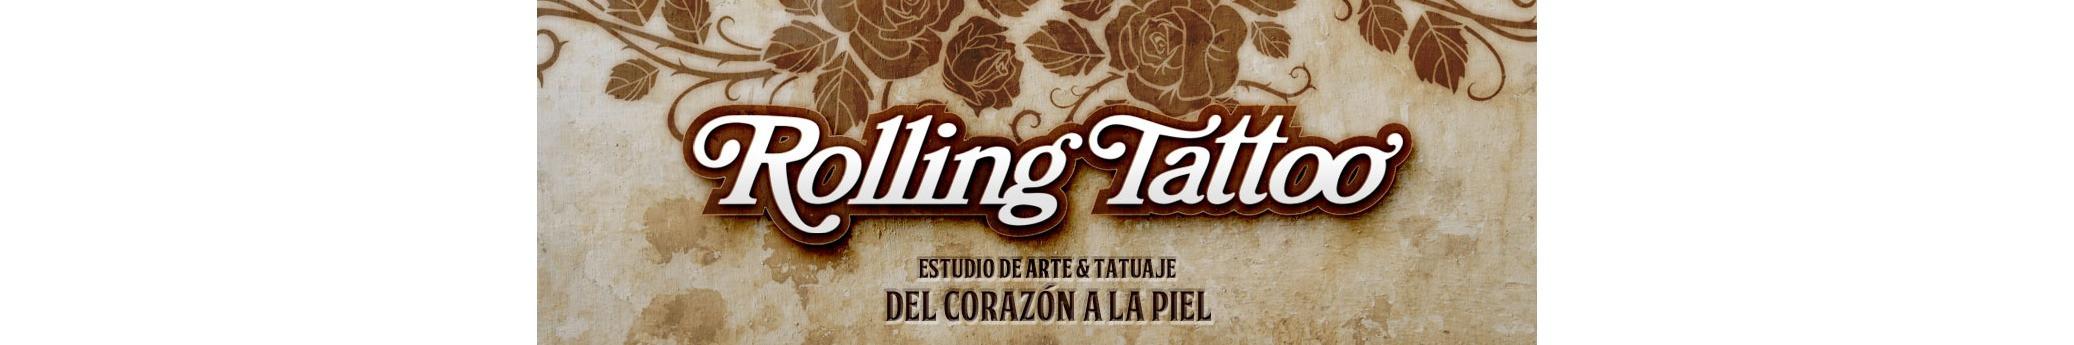 Rolling Tattoo Fuengirola - Del Corazón a la Piel